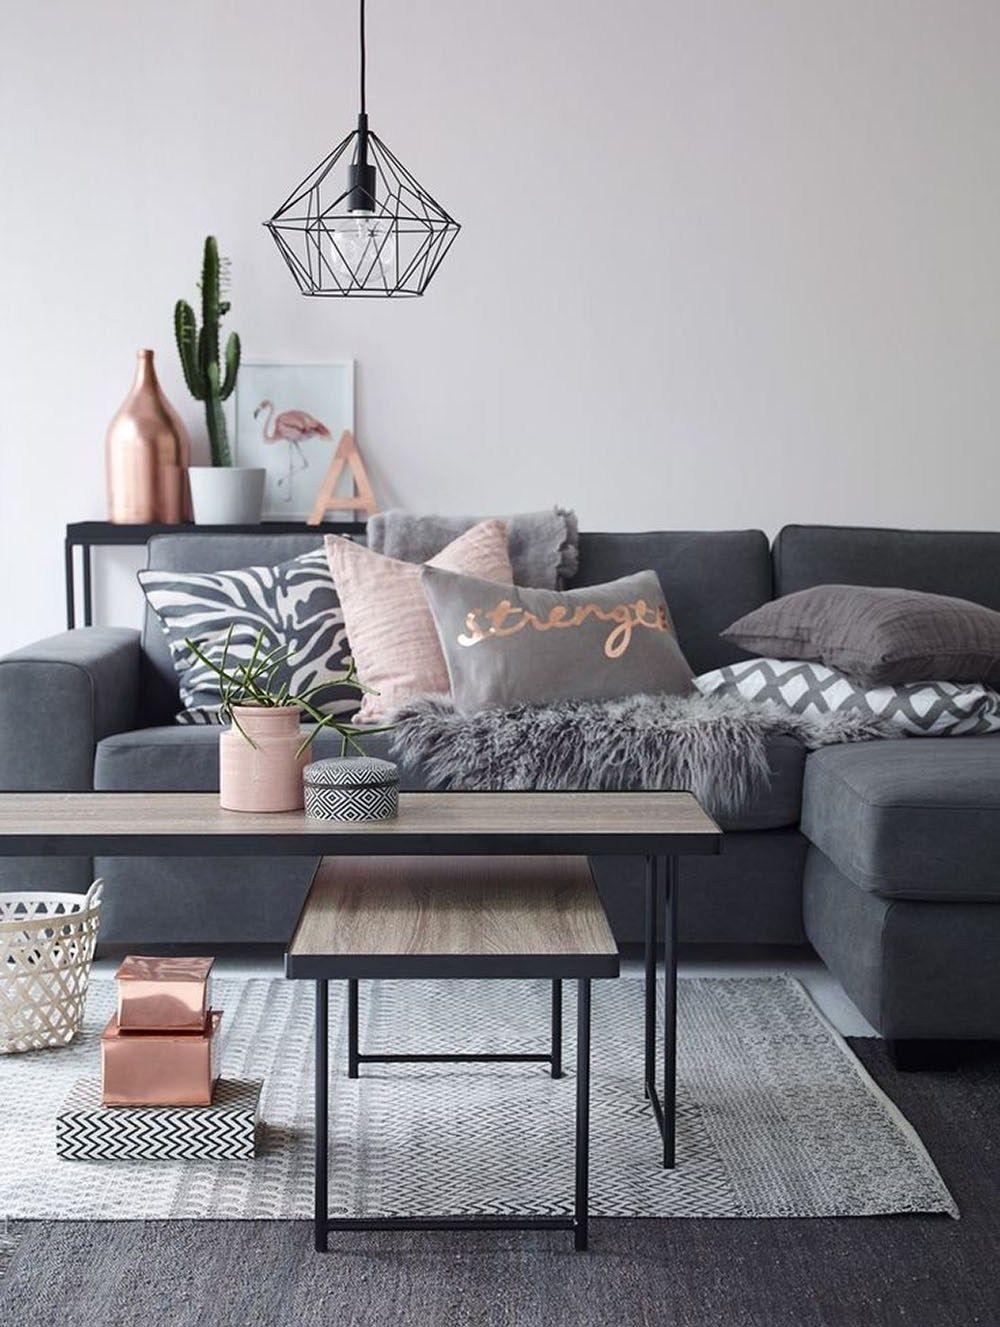 StyleAndMinimalism-Interior-Inspiration-Blush-Pink-Charcoal-Grey-008.jpg 1000×1327 pixels